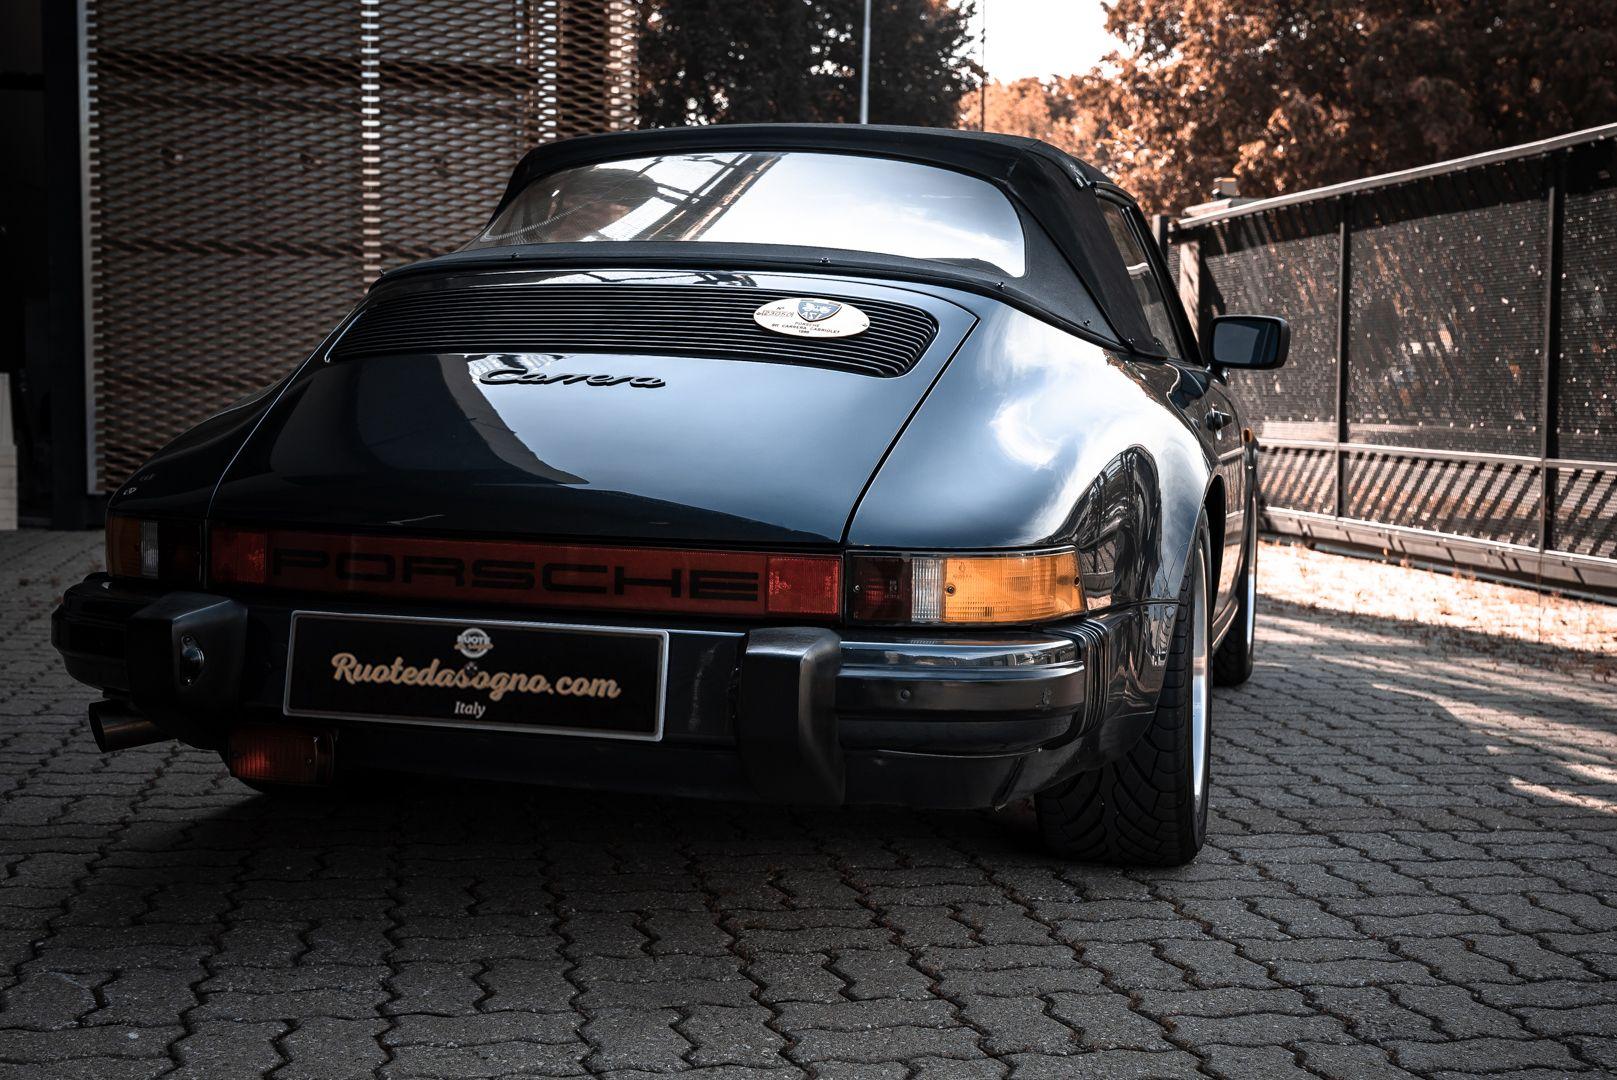 1986 Porsche 911 Carrera 3.2 Cabrio 70899